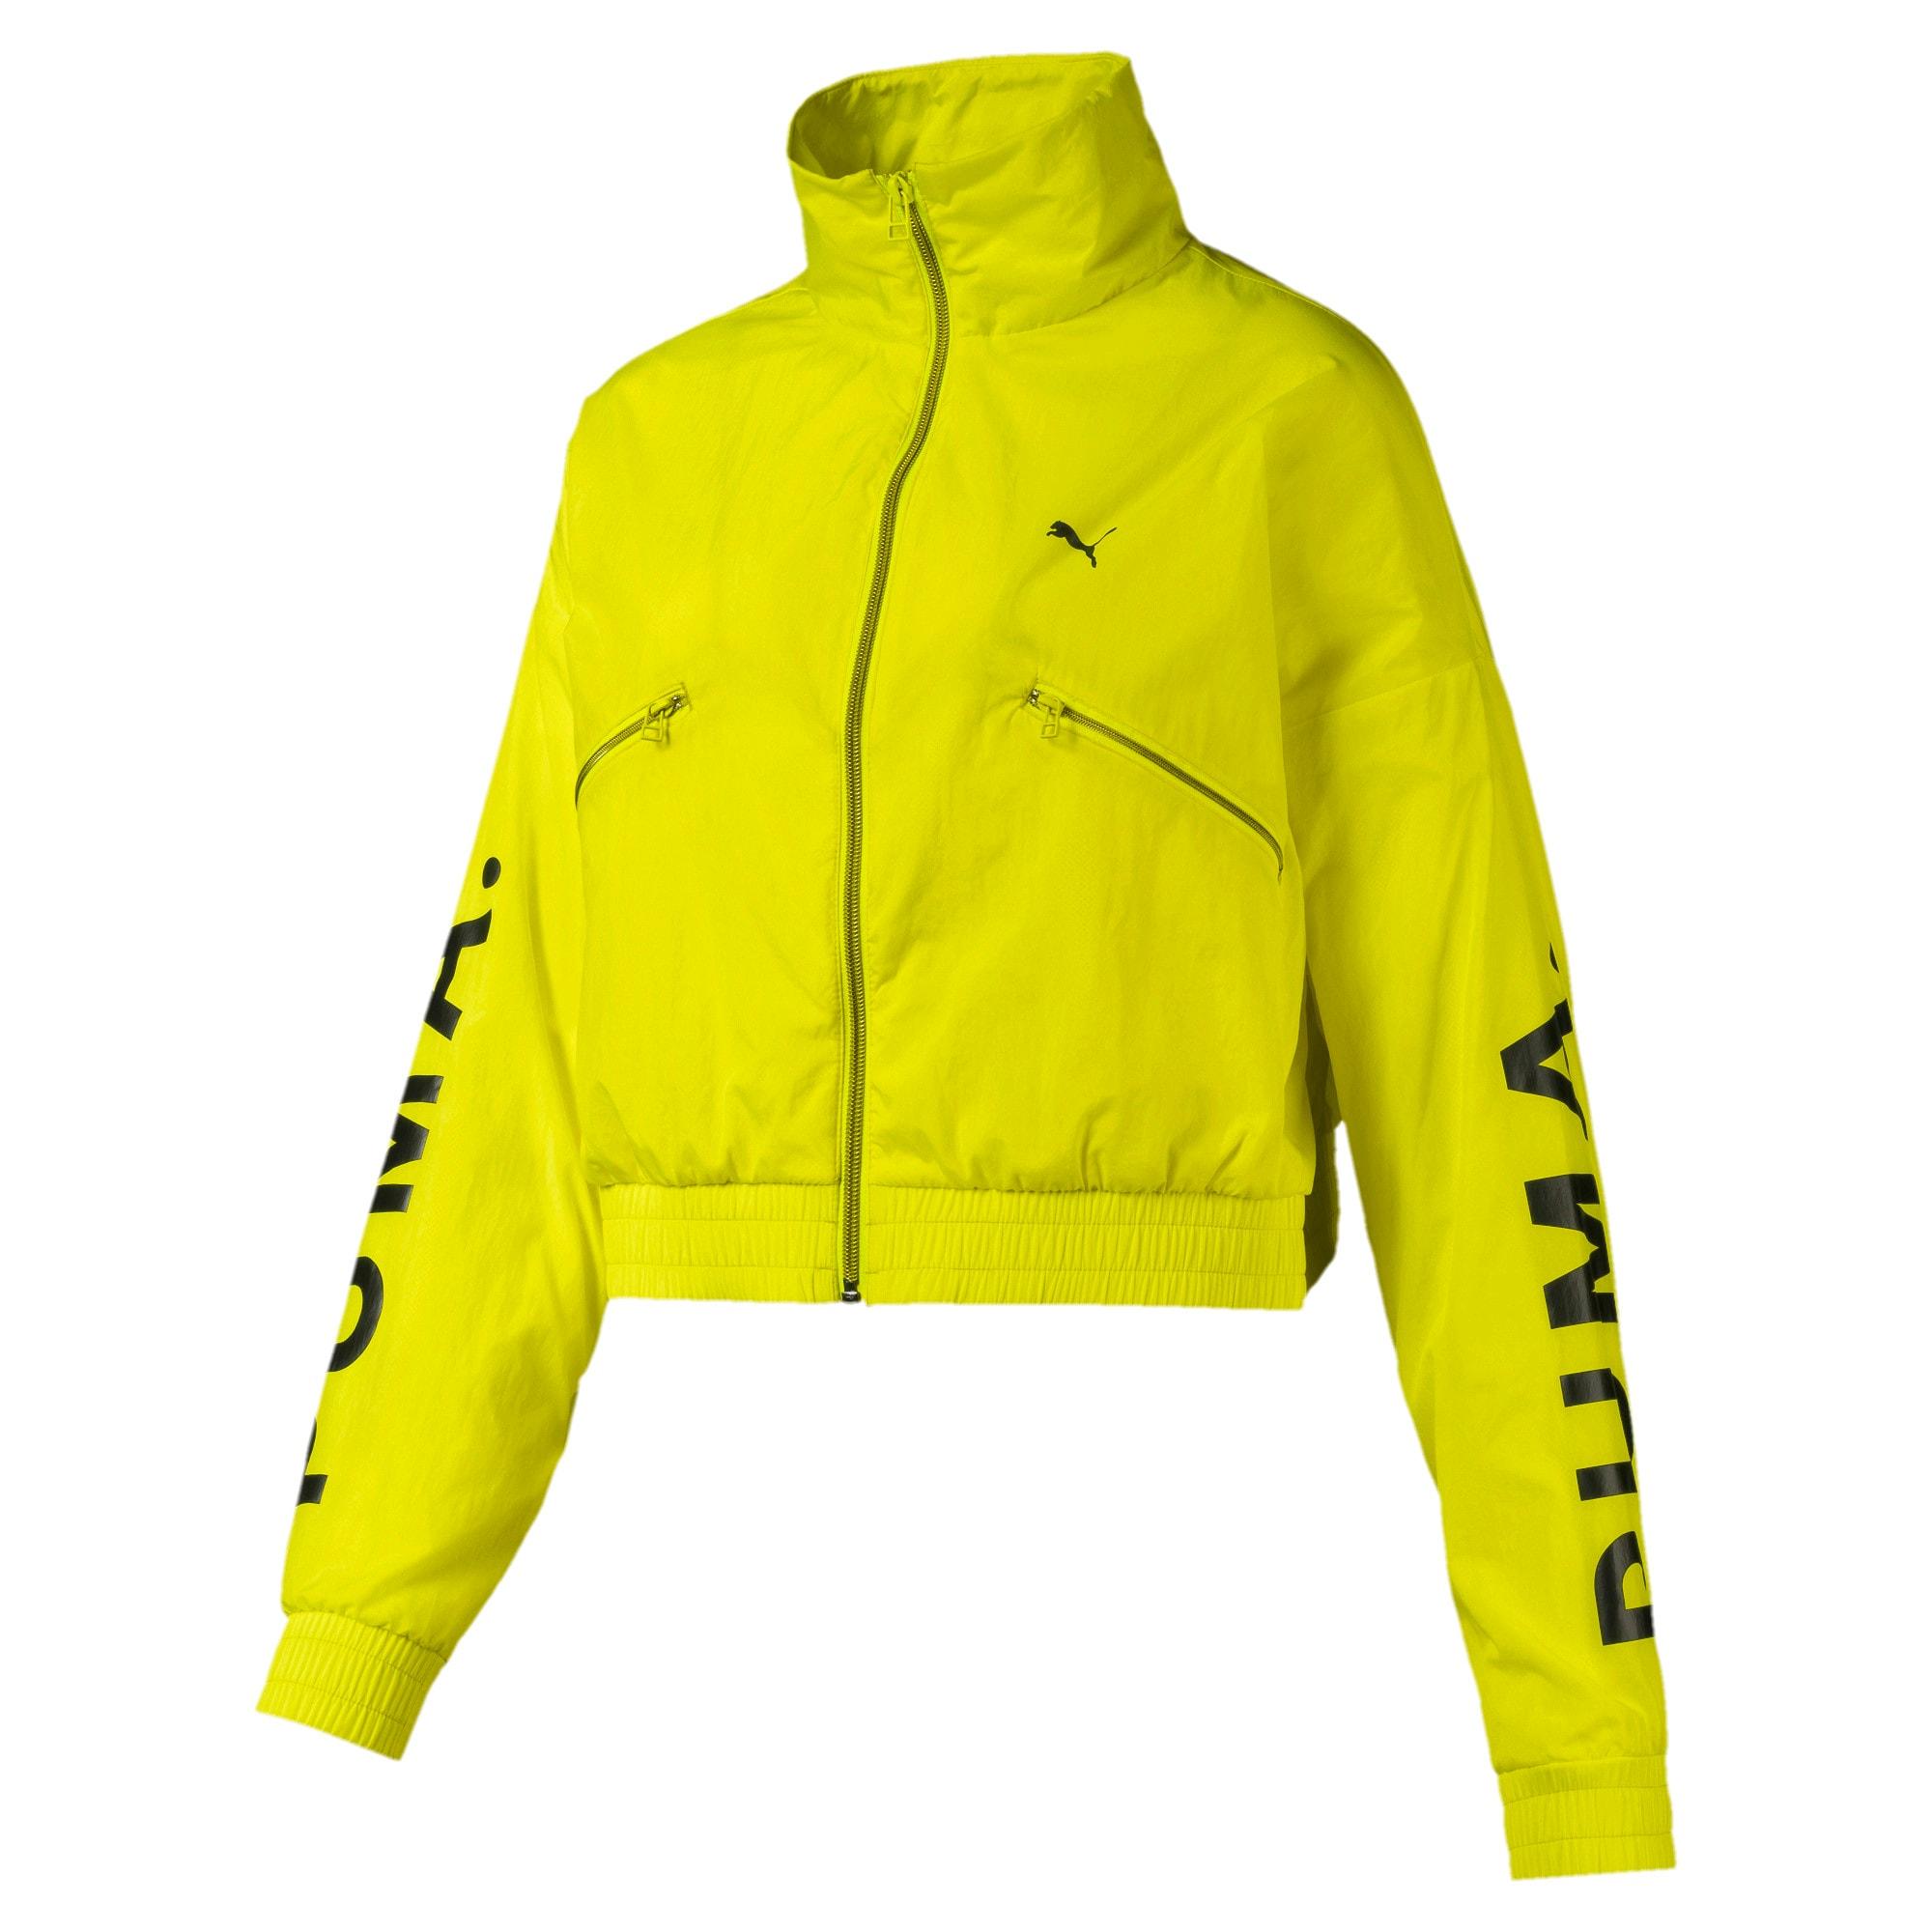 Thumbnail 4 of Chase Woven Women's Jacket, Yellow Alert, medium